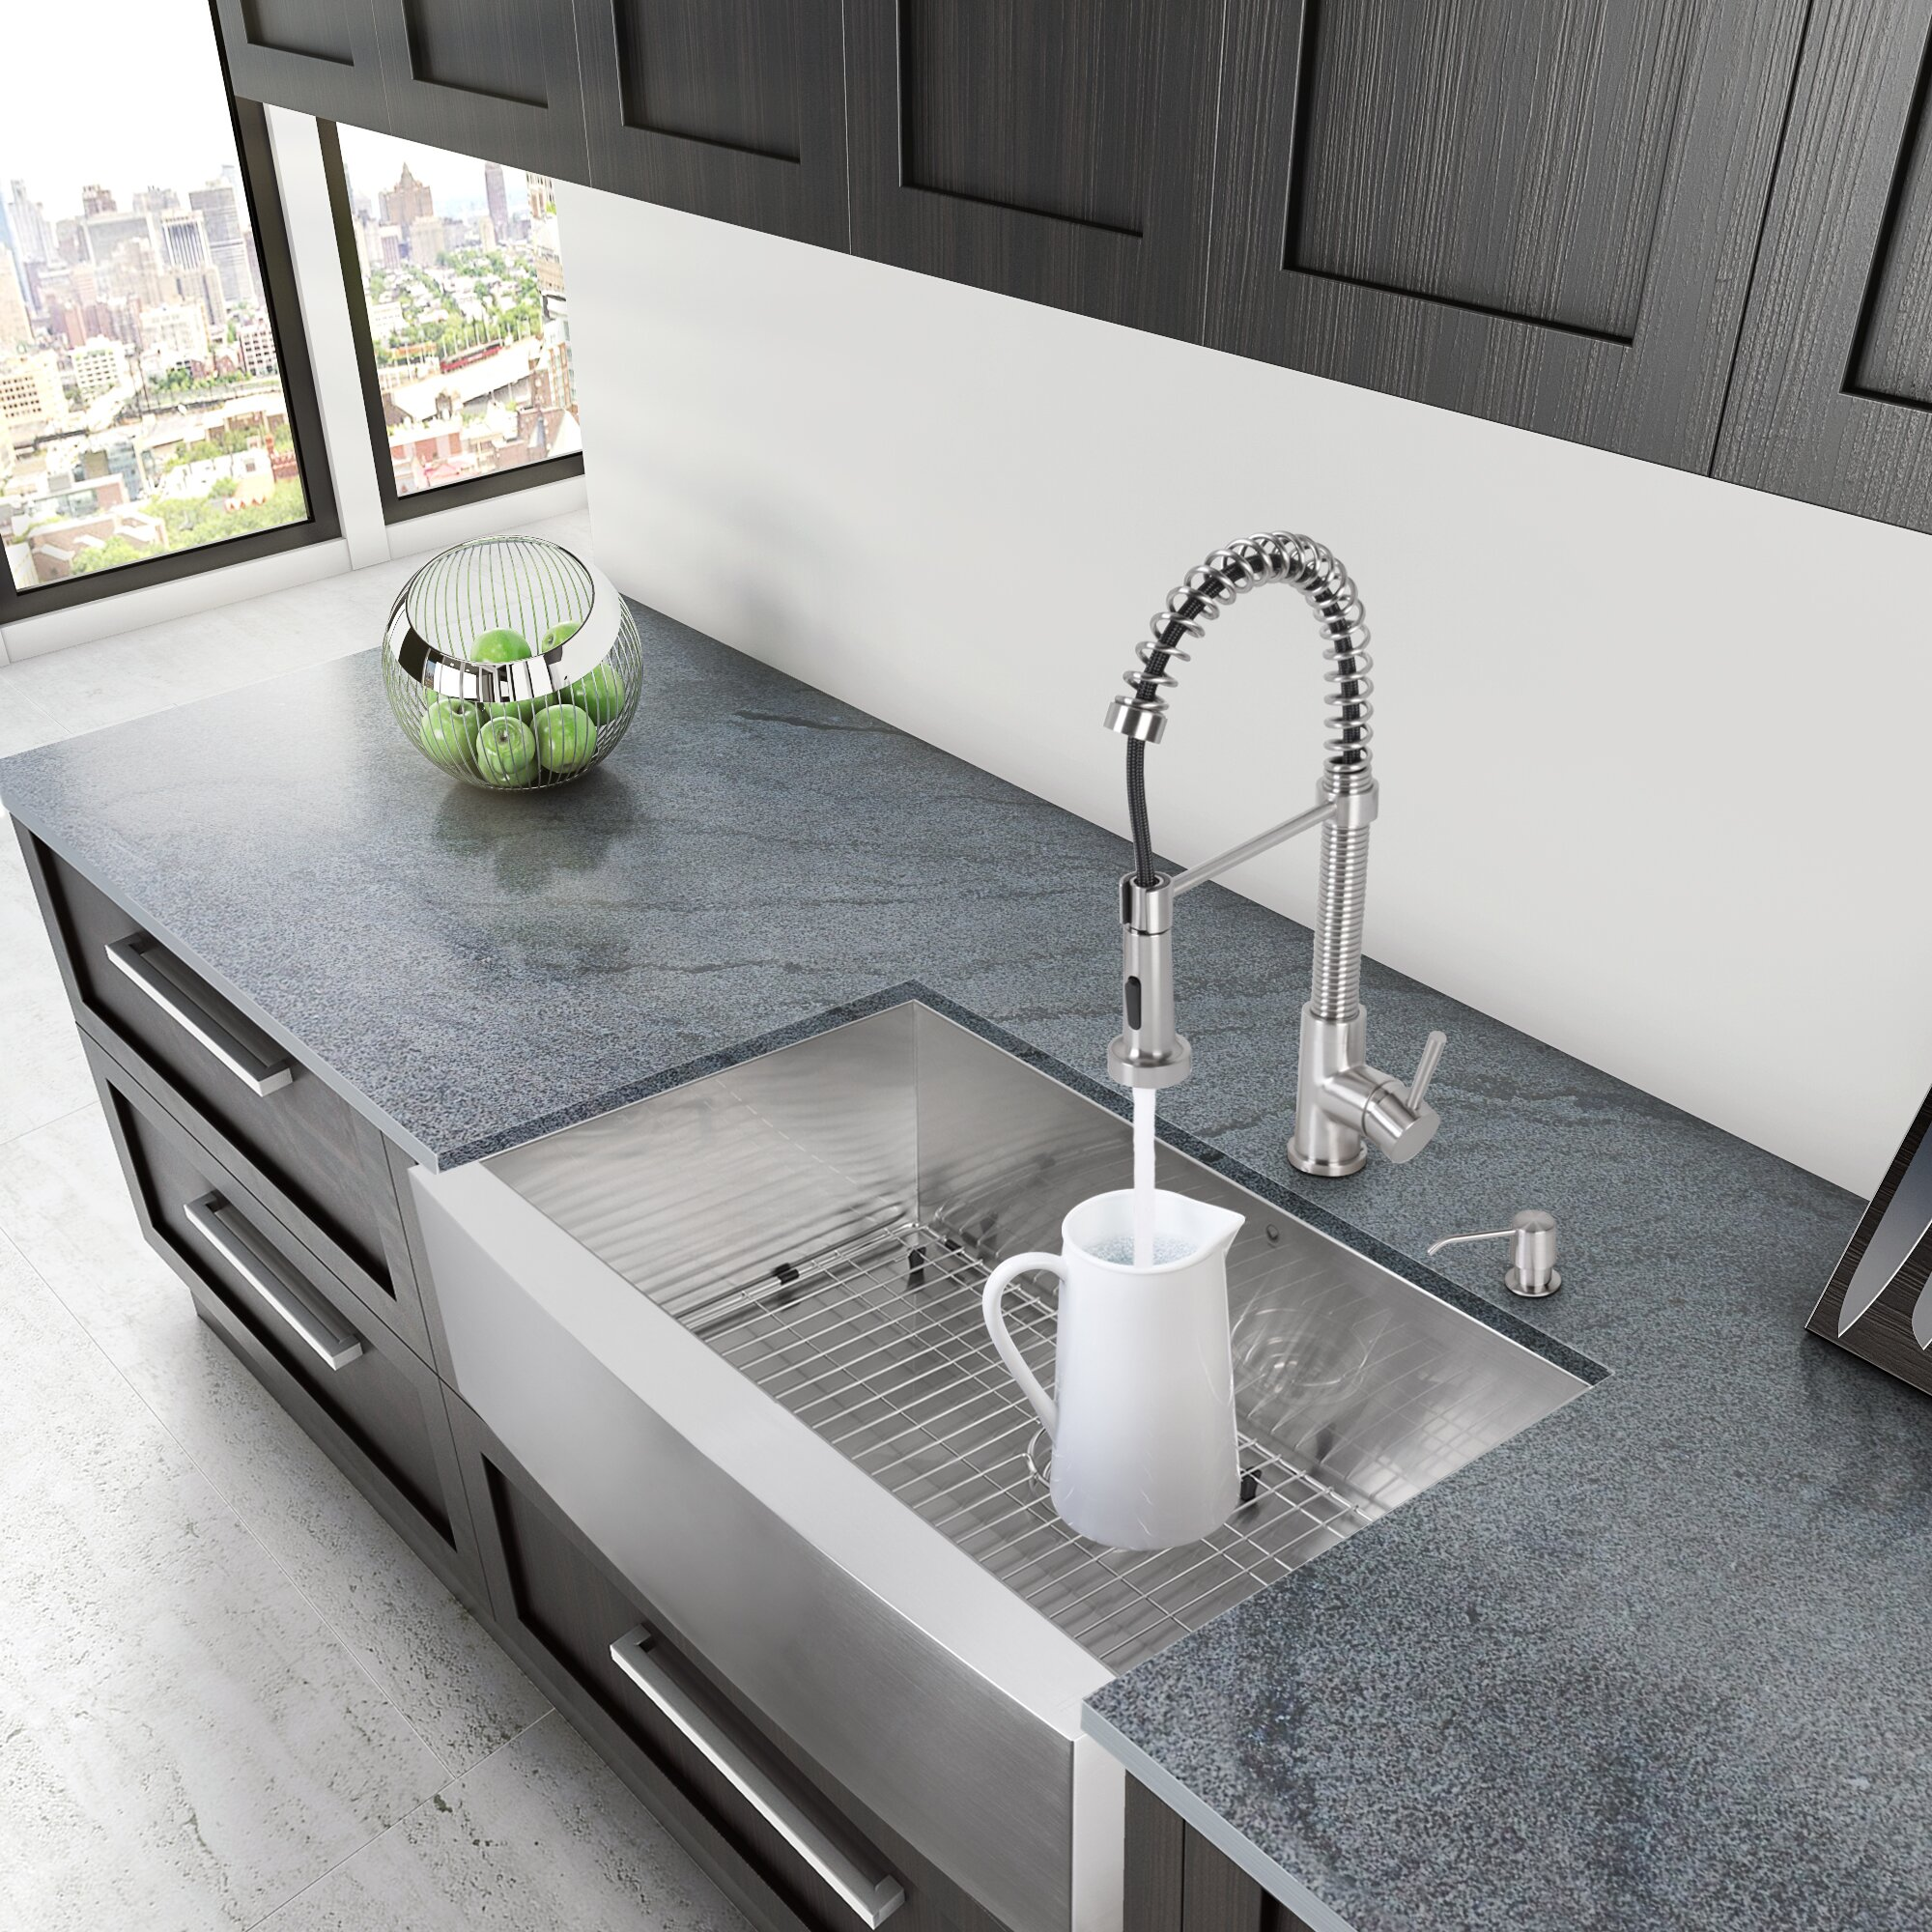 Charming 30 Kitchen Sink #13: Vigo Alma 30u0026amp;quot; Farmhouse Apron Single Bowl 16 Gauge Stainless Steel Kitchen Sink